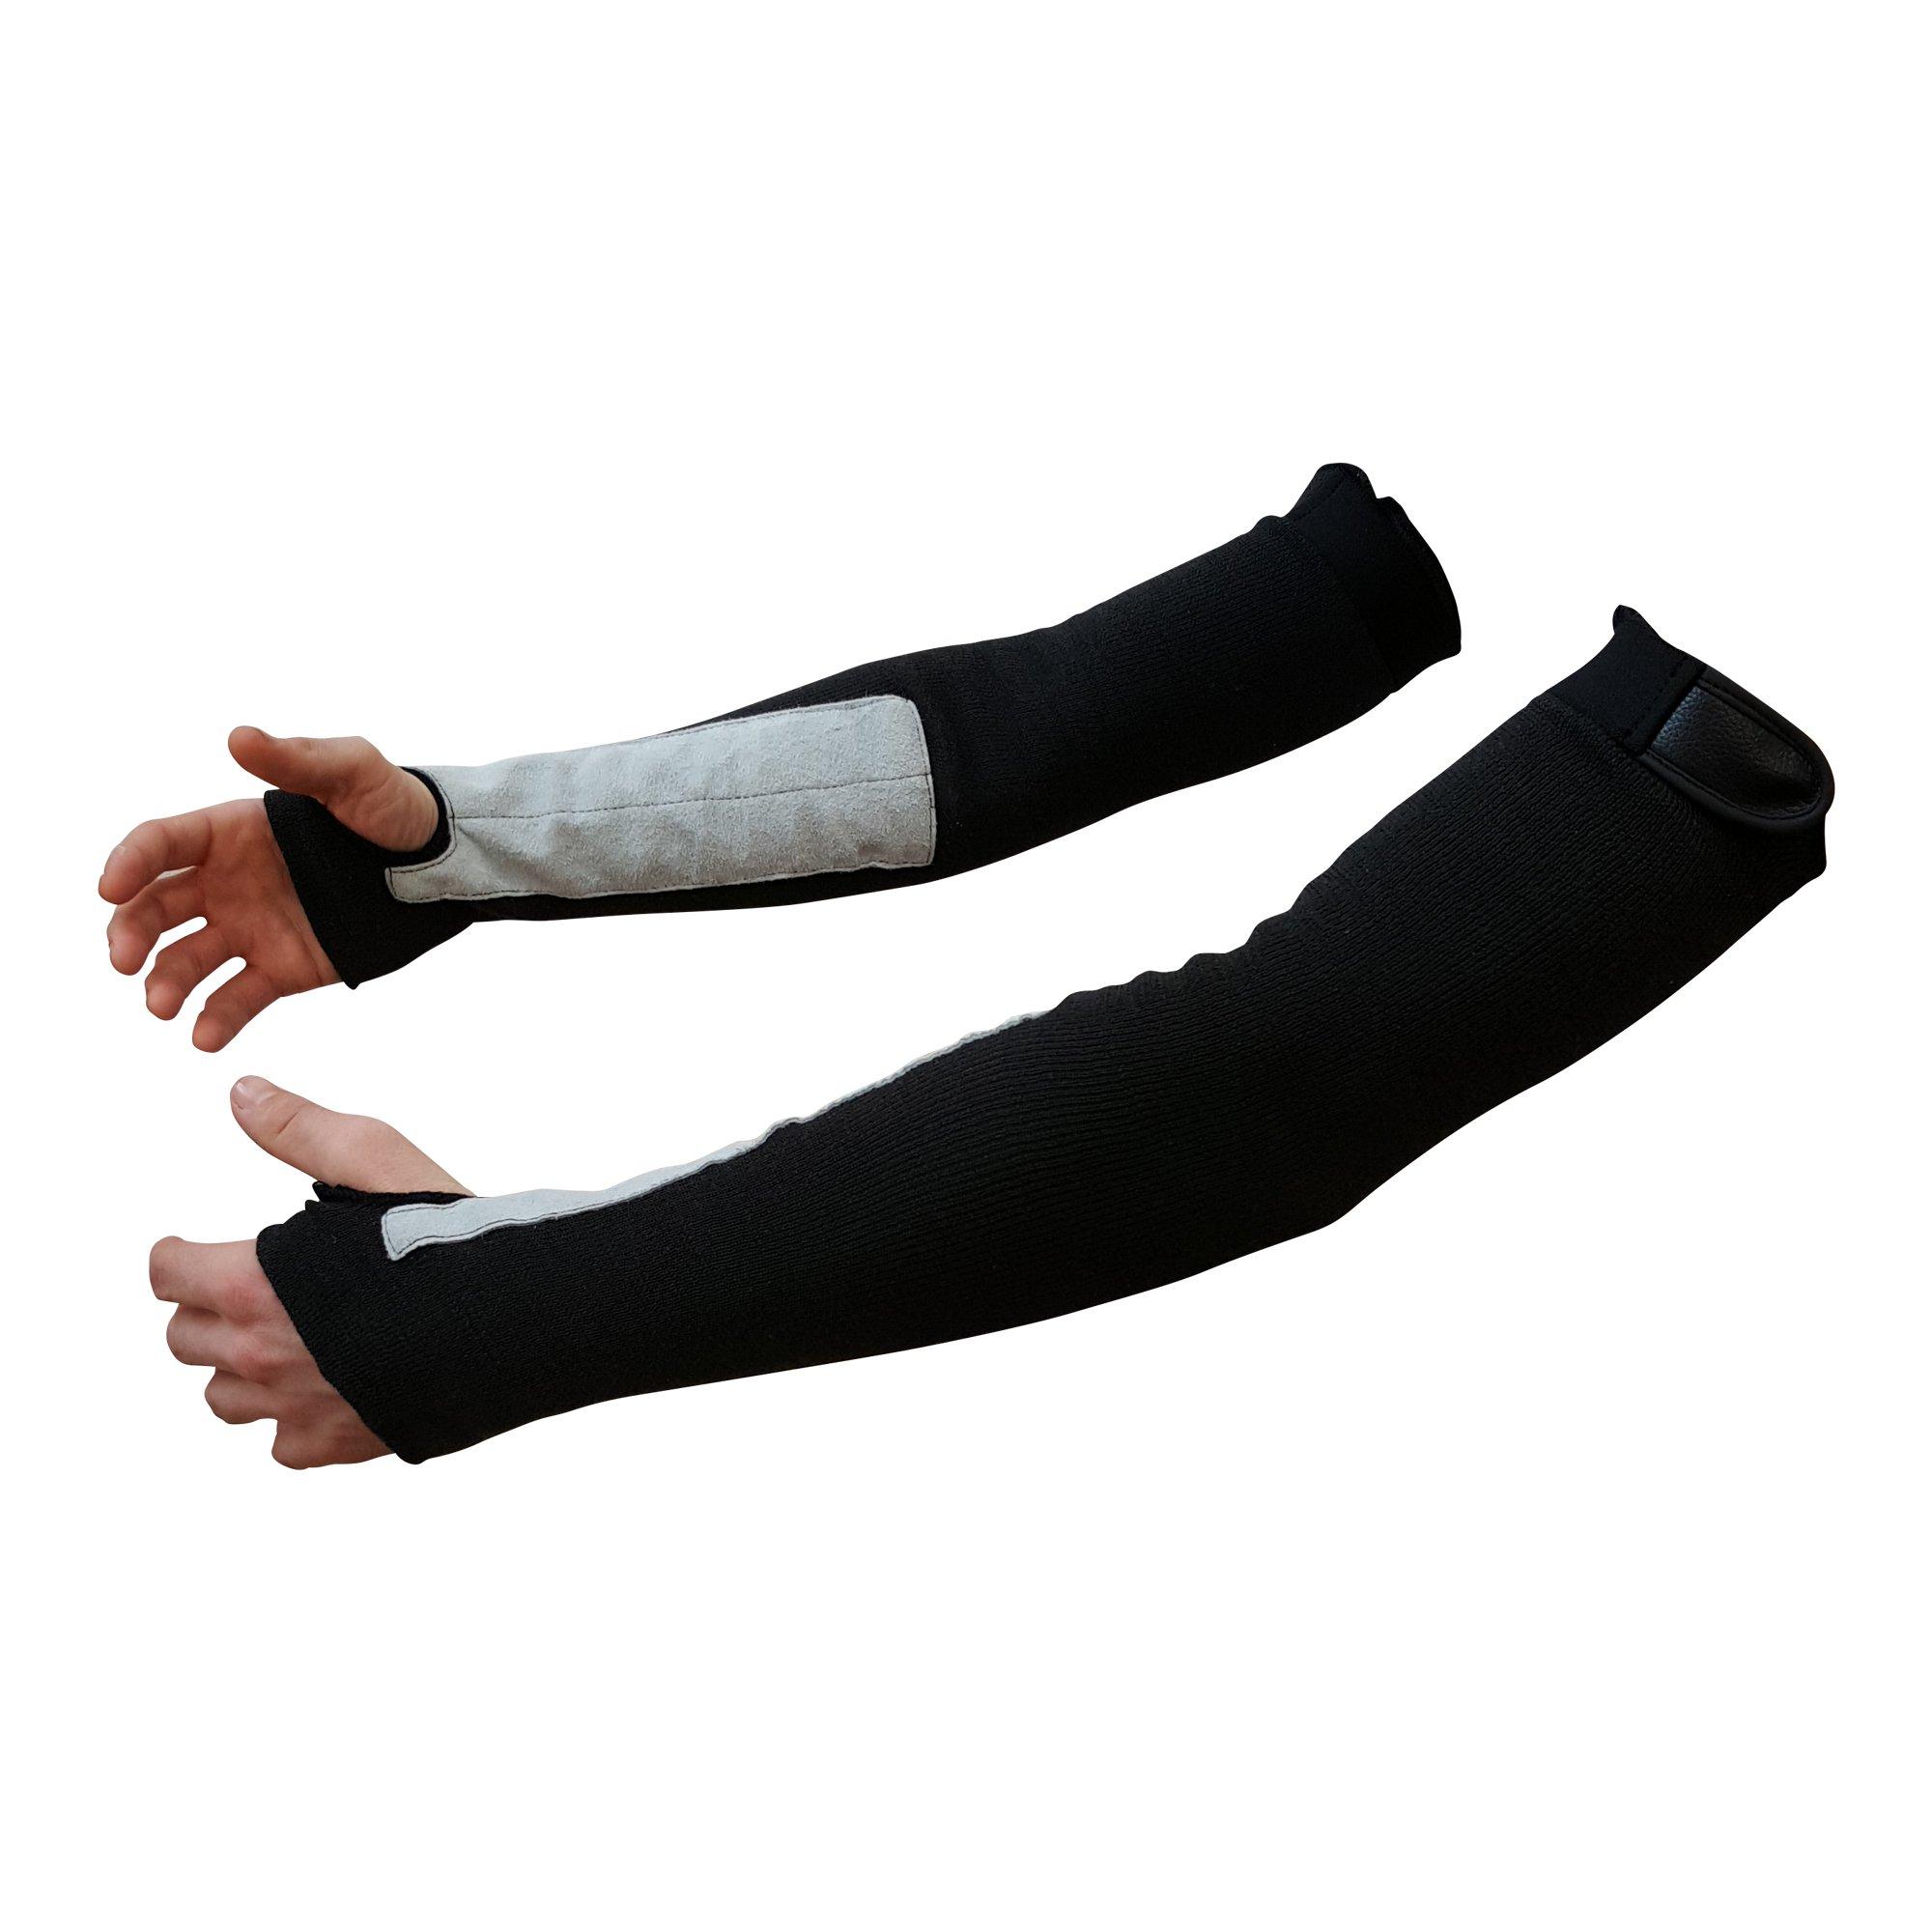 "22"" Black Kevlar Protective Arm Sleeves / Cut And Heat Resistant (1 Pair)"